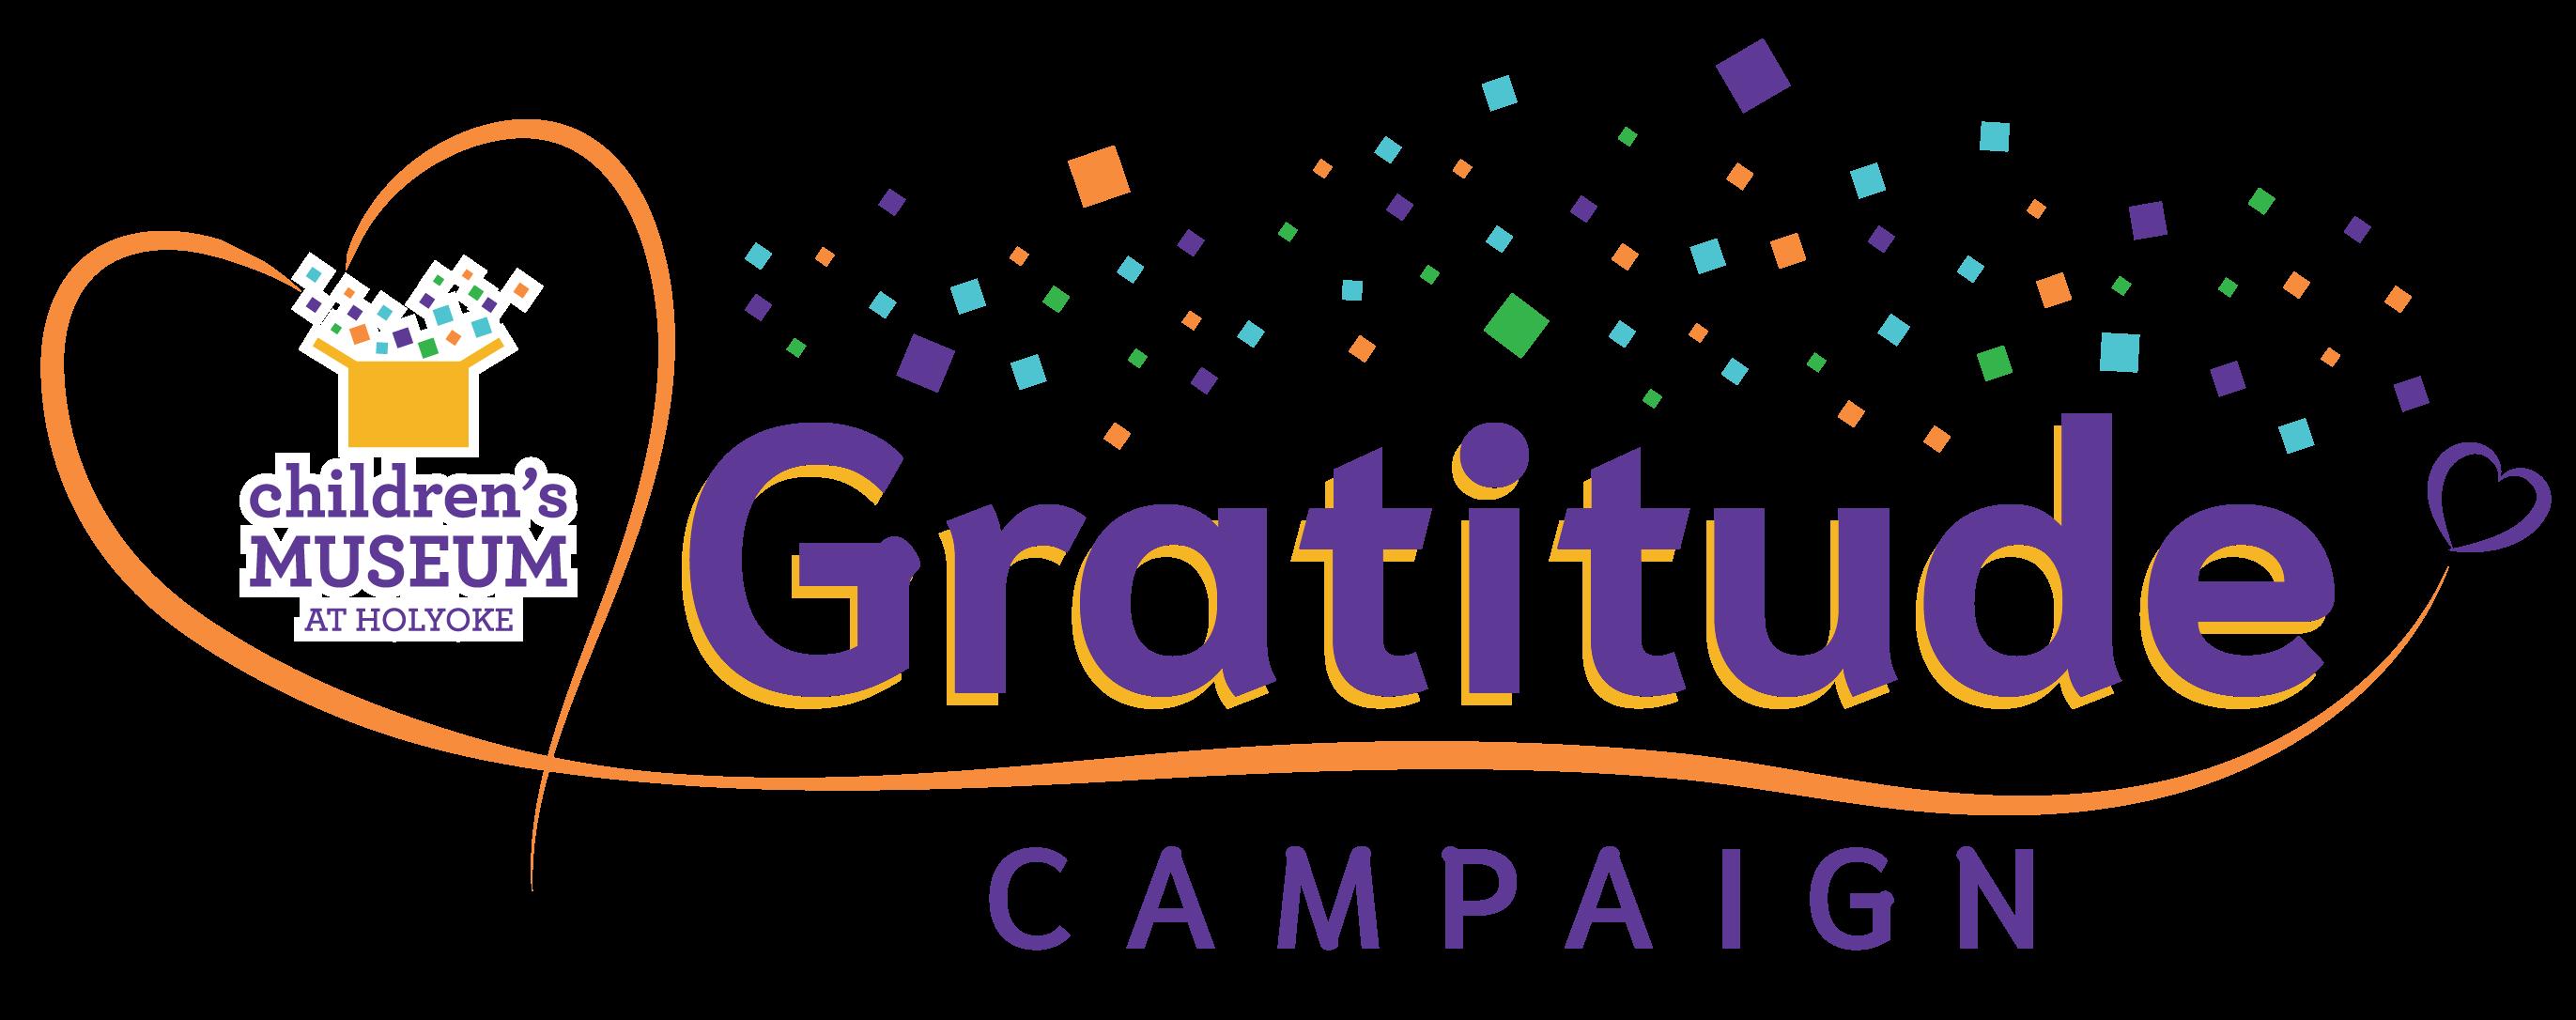 Children's Museum at Holyoke Gratitude Campaign logo